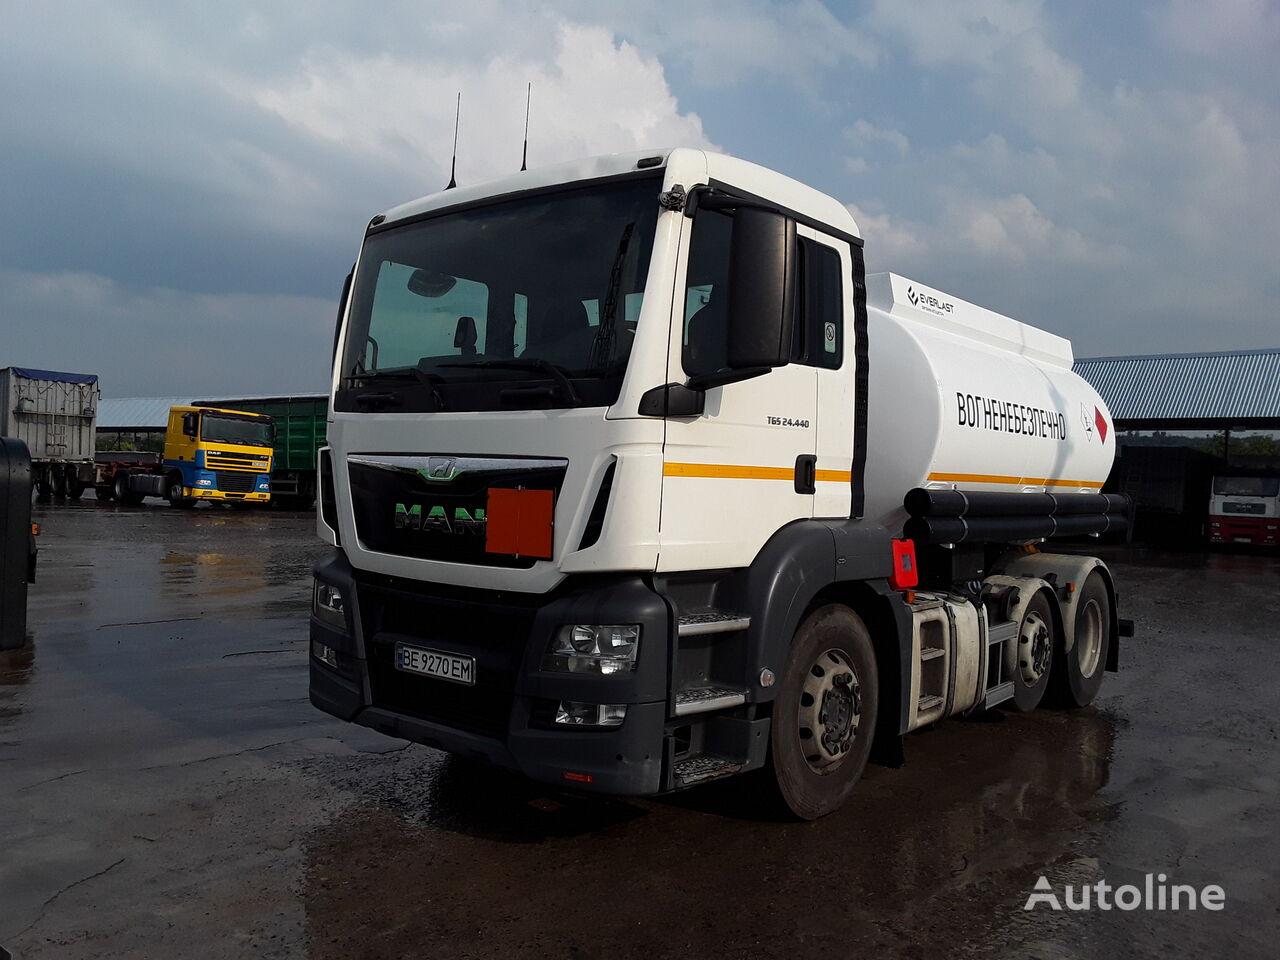 MAN TGS 24.440 brandstoftruck